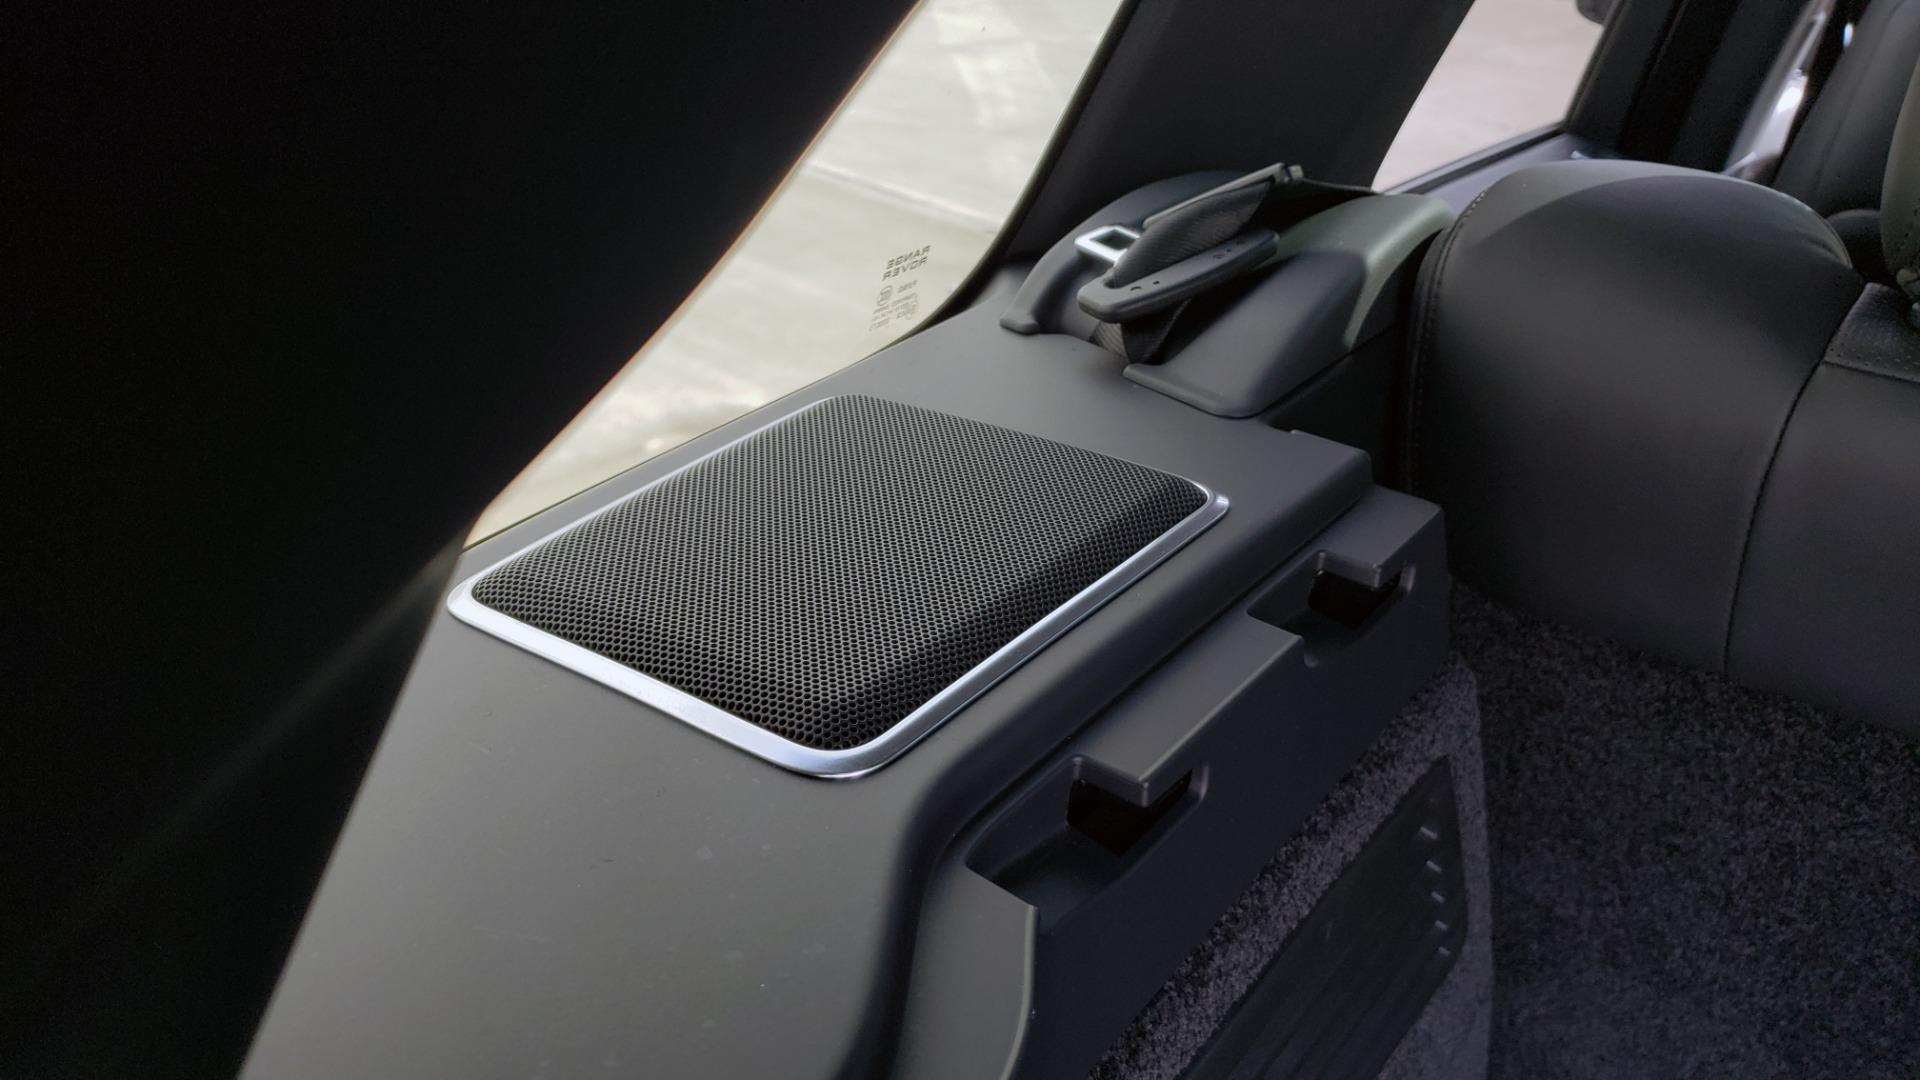 Used 2017 Land Rover RANGE ROVER SC V8 / VISION ASST / DRIVE PKG / MERIDIAN SOUND / PANO-ROOF / NAV / BSM for sale $75,995 at Formula Imports in Charlotte NC 28227 22